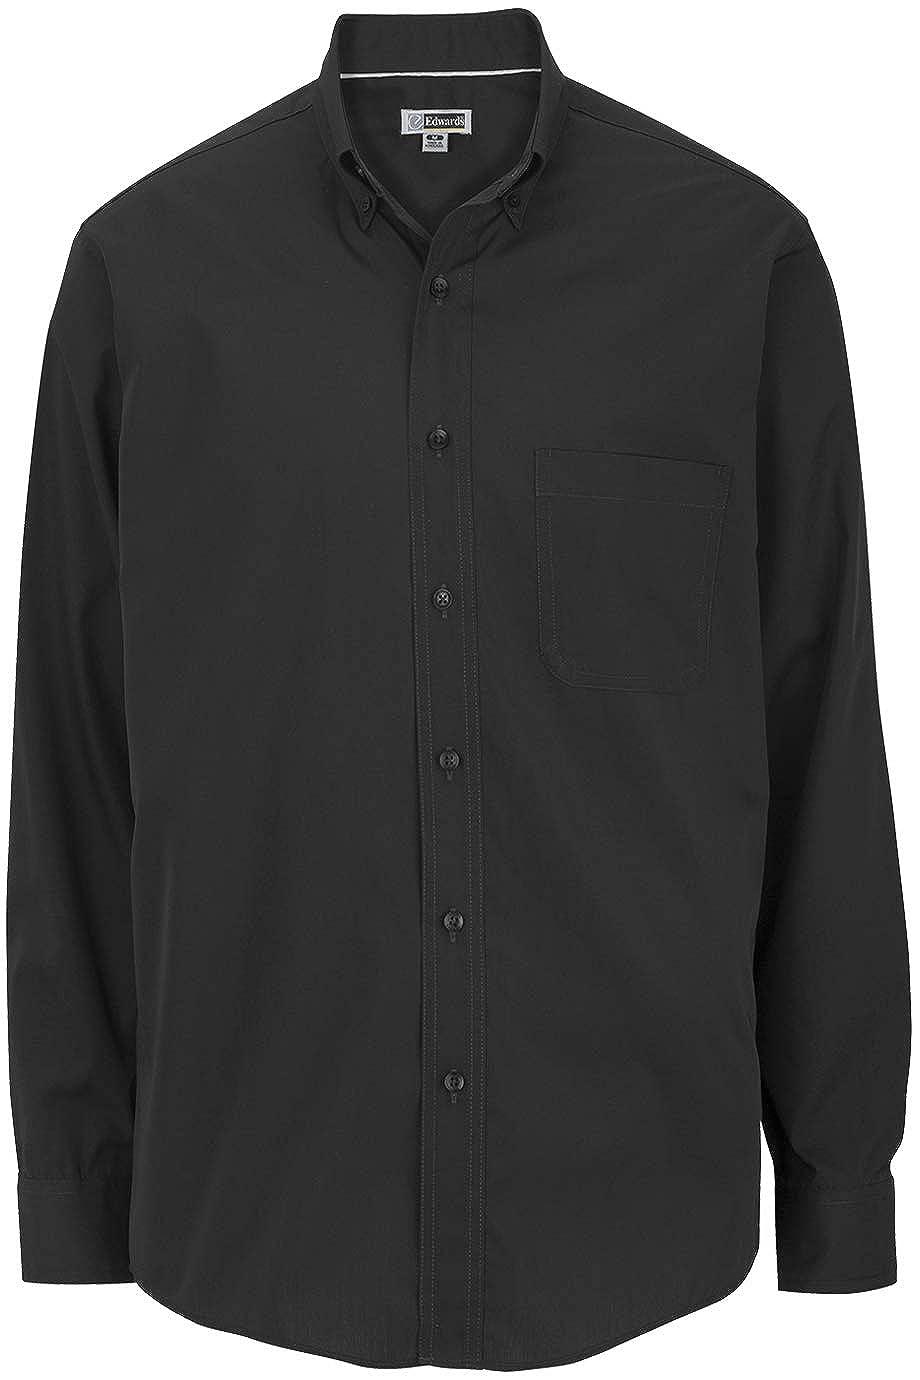 Edwards Mens COTTONPLUS Long Sleeve Twill Shirt